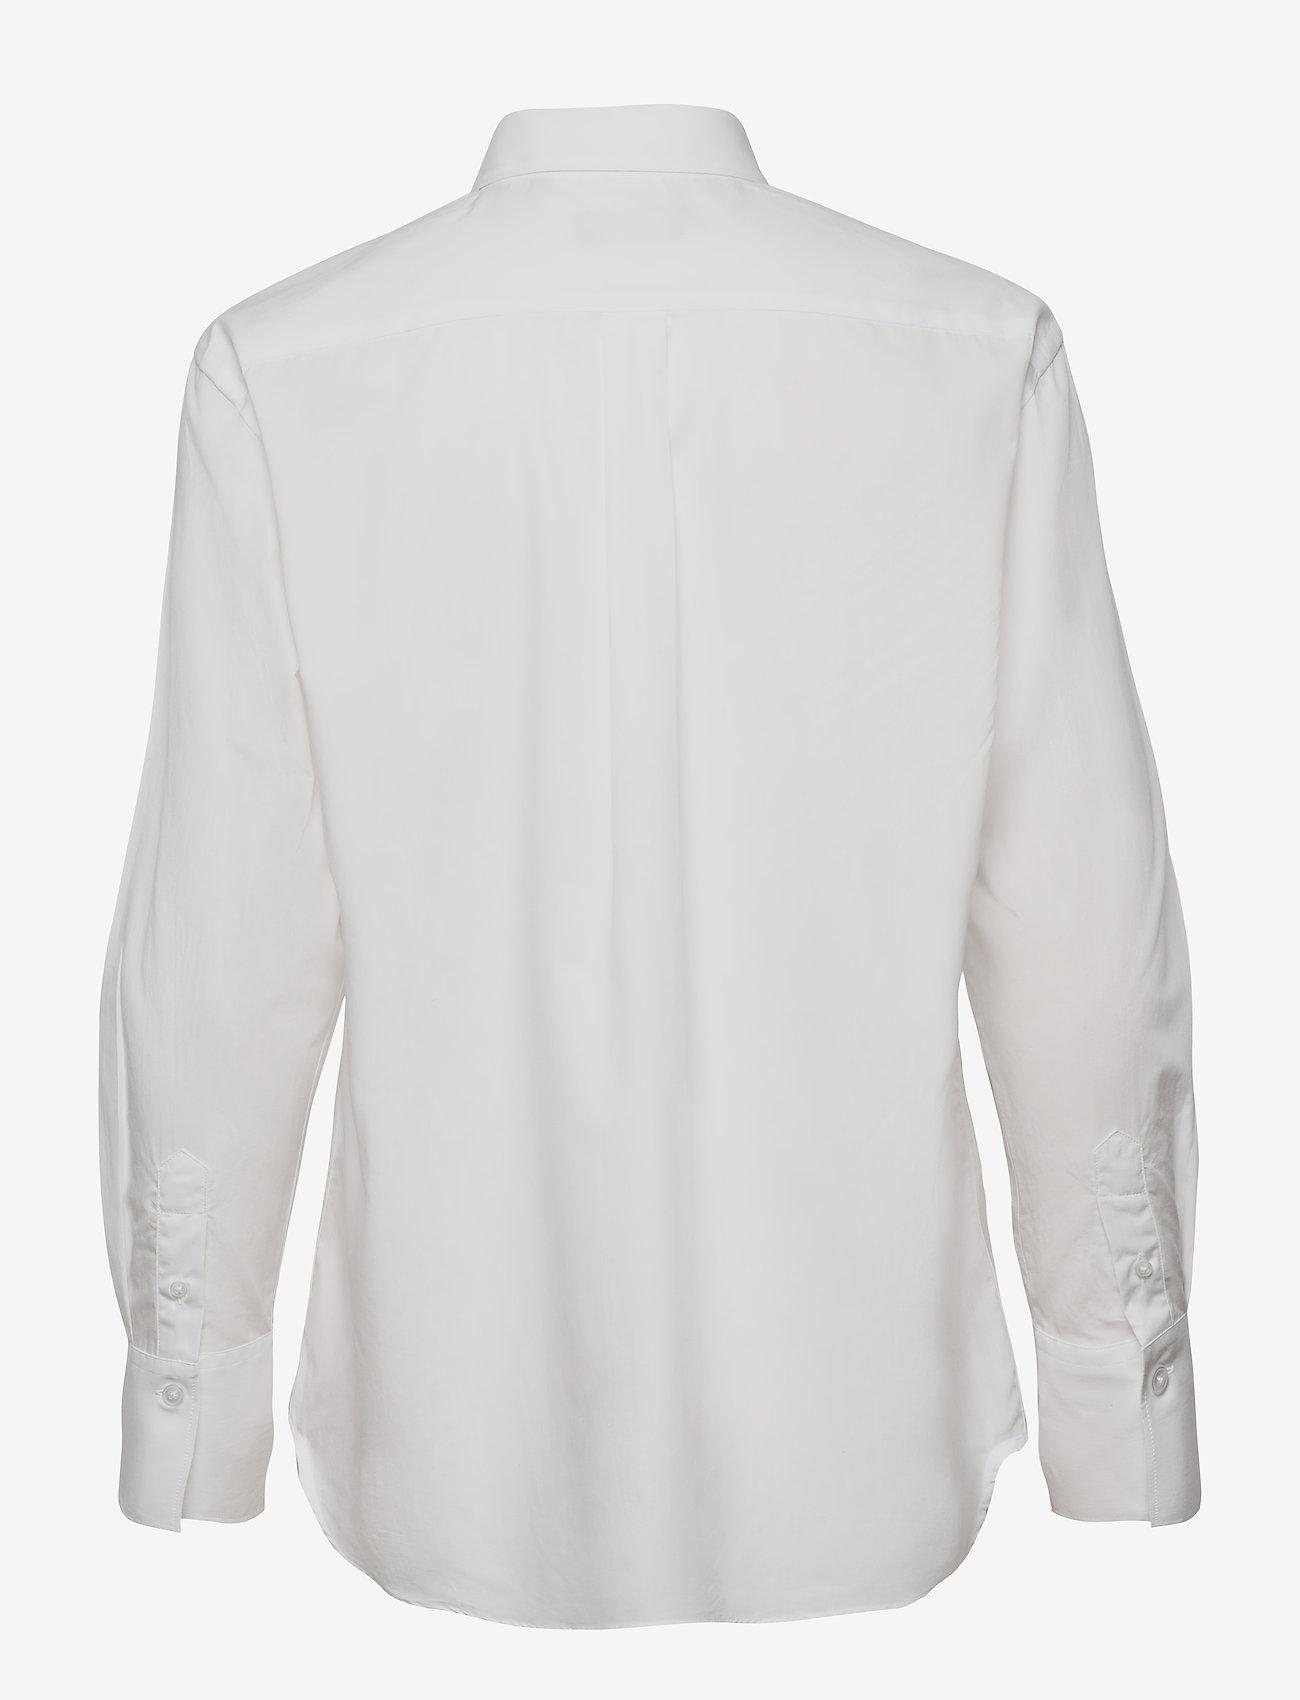 SAND - 8704 - Nube - chemises à manches longues - optical white - 1